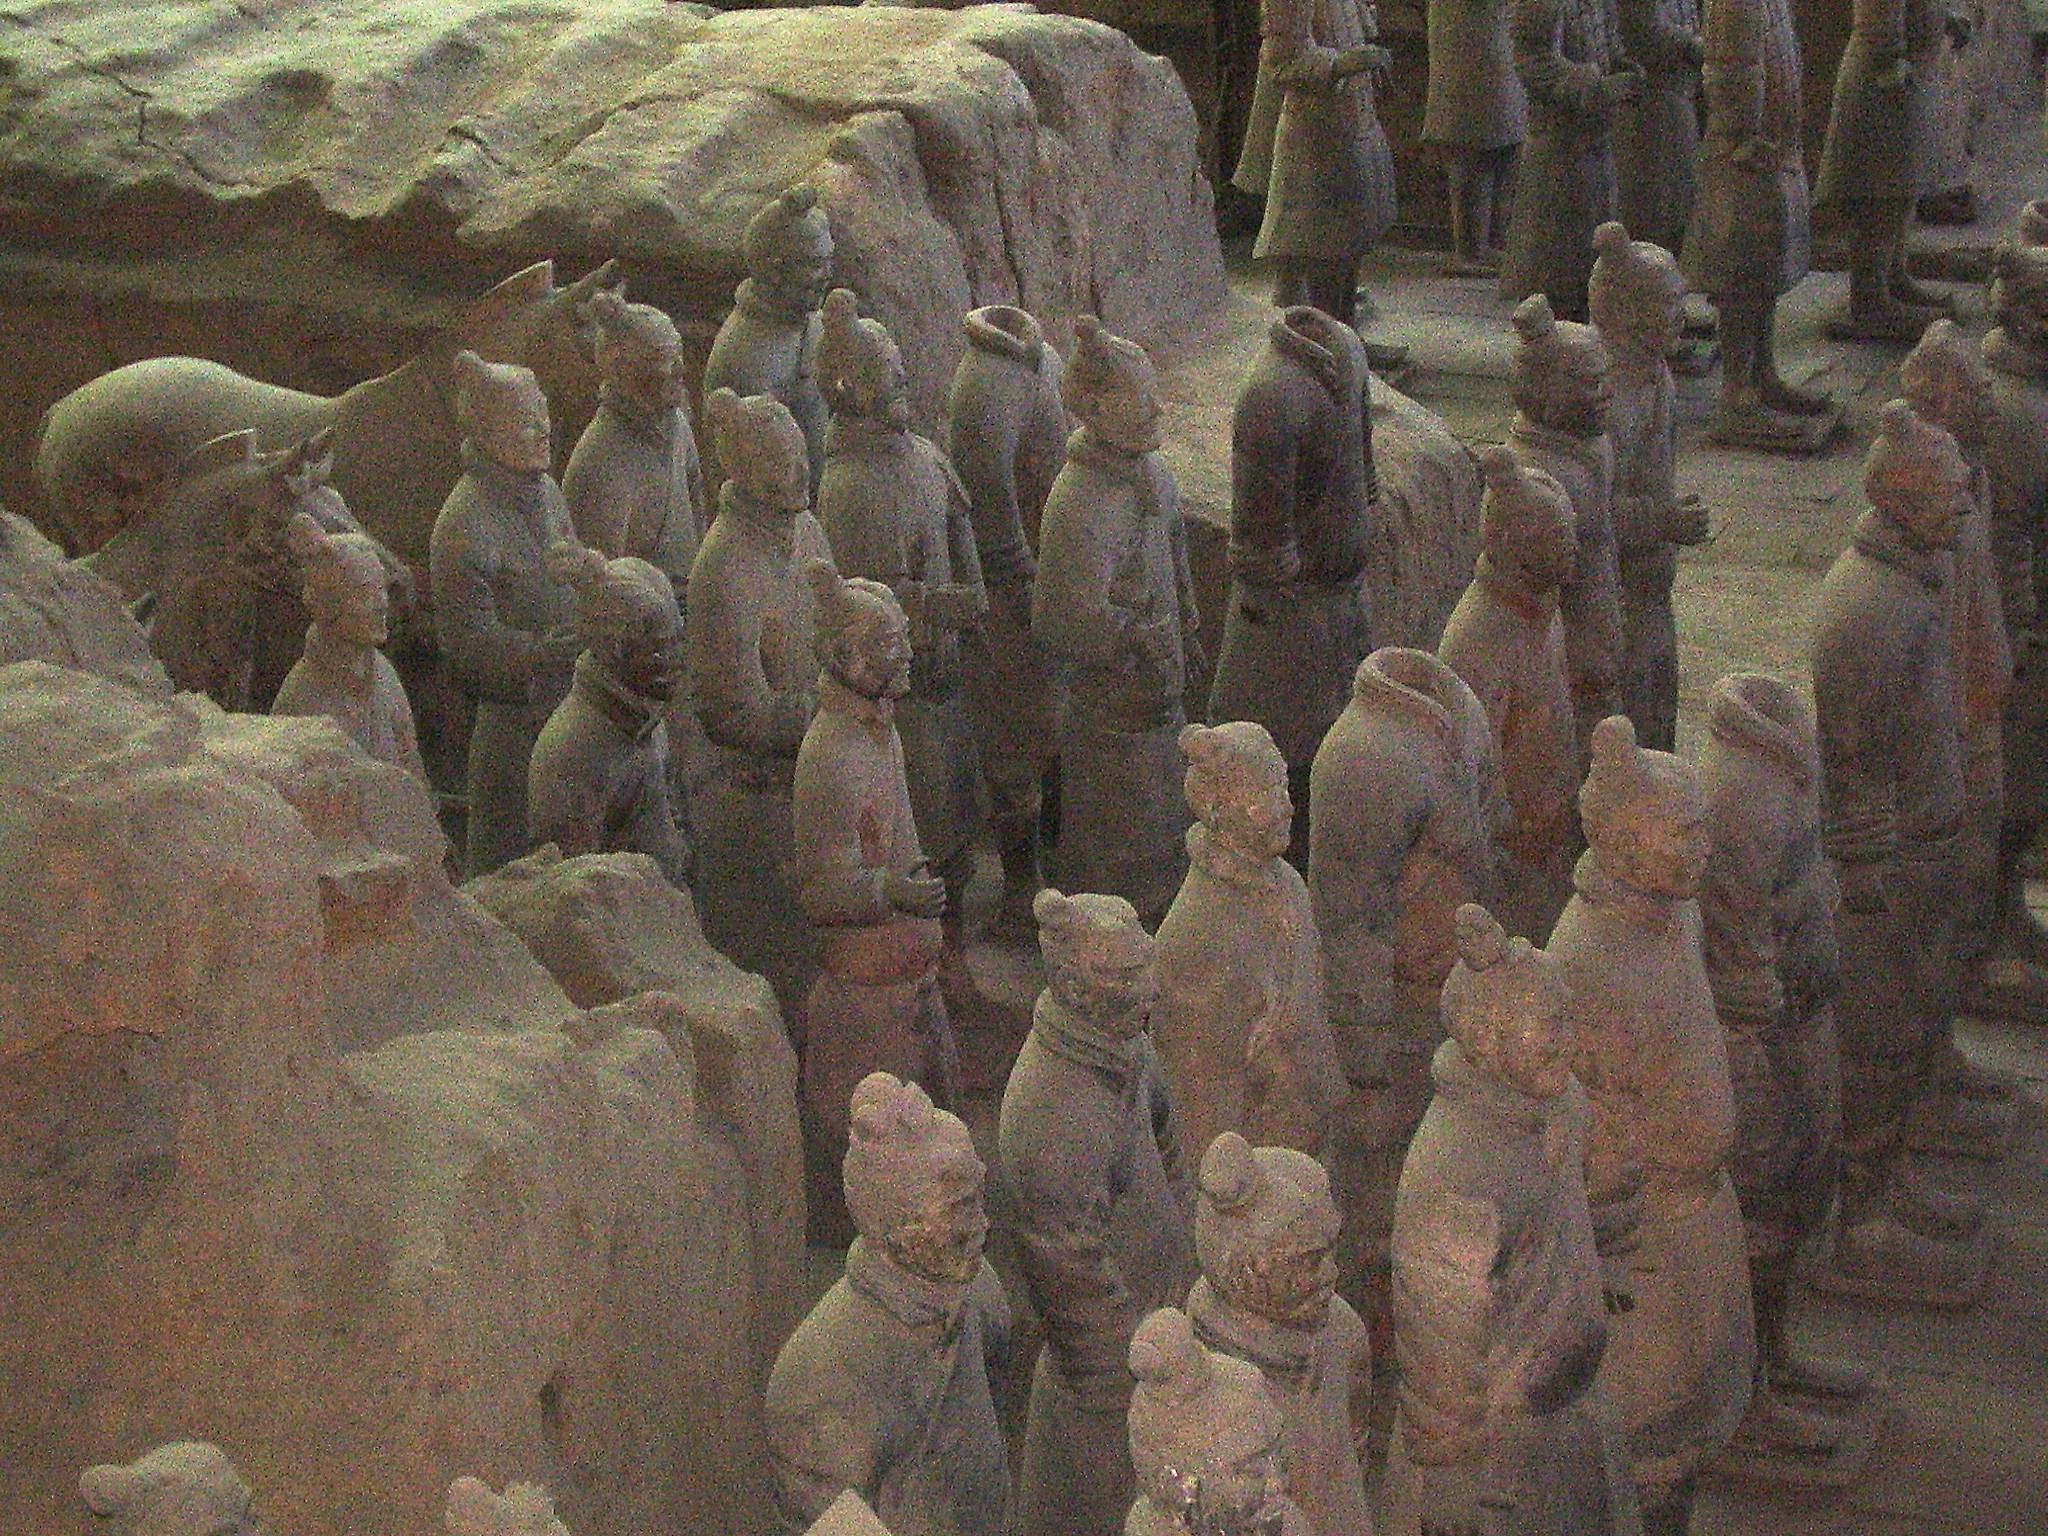 Grand Treasures: The Terracotta Warriors of Xian, China